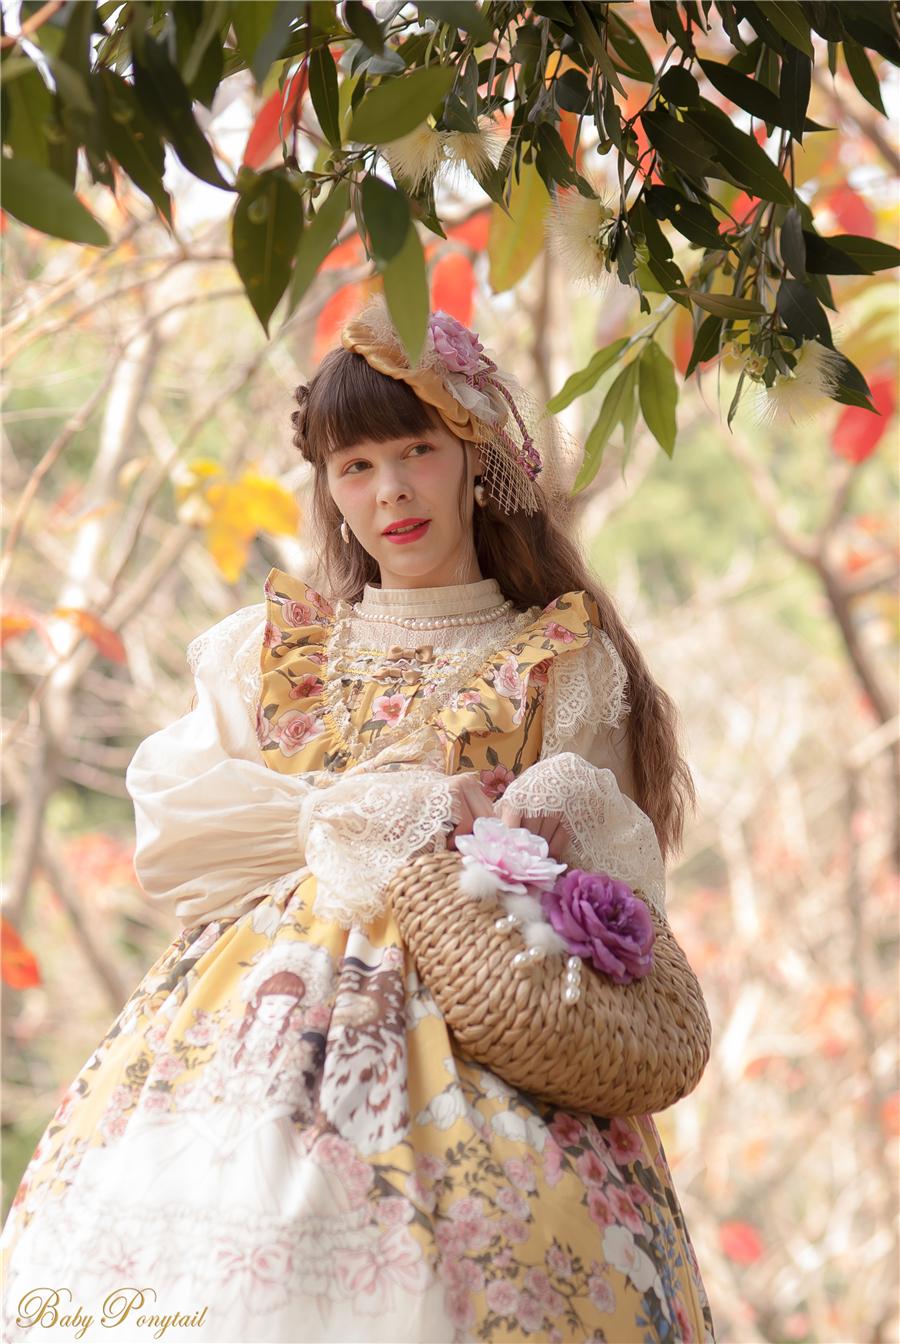 Baby Ponytail_Model Photo_Polly's Garden of Dreams_JSK Yellow_Claudia_2.jpg